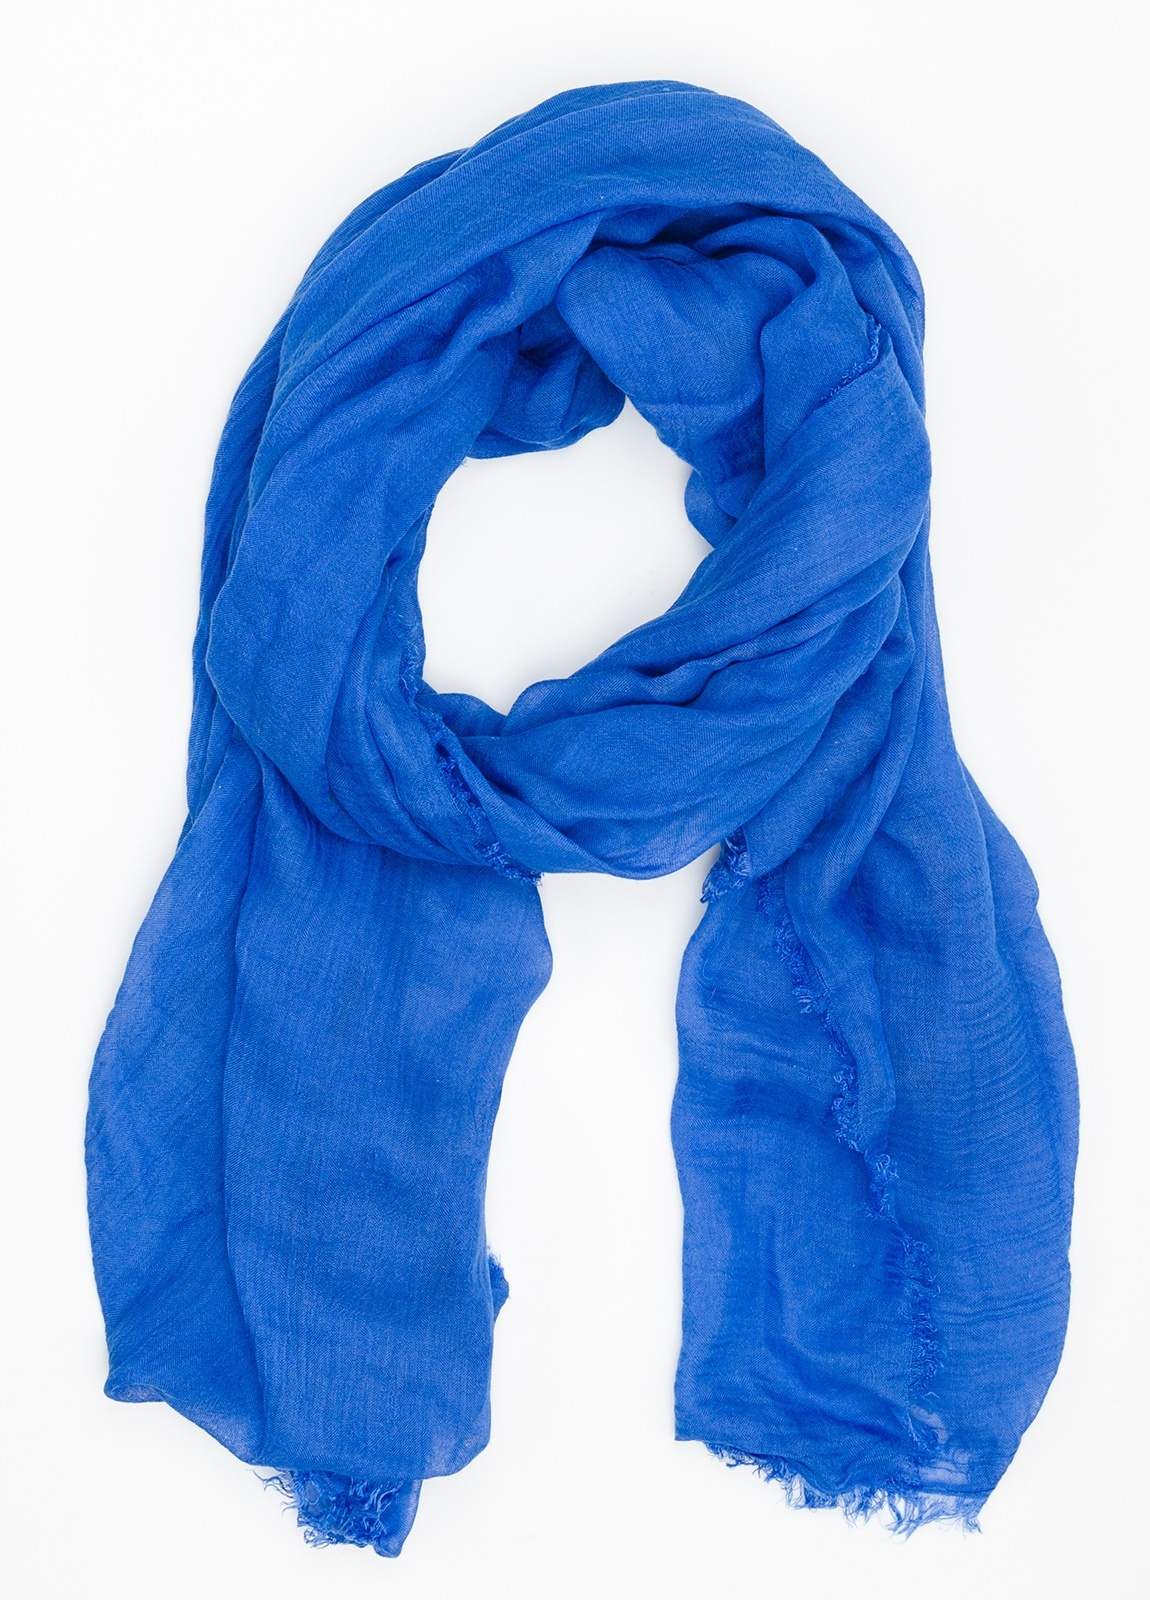 Foulard liso color azulón. Modelo 65 X 180 cm. 80% Modal 20% Seda Crepe.